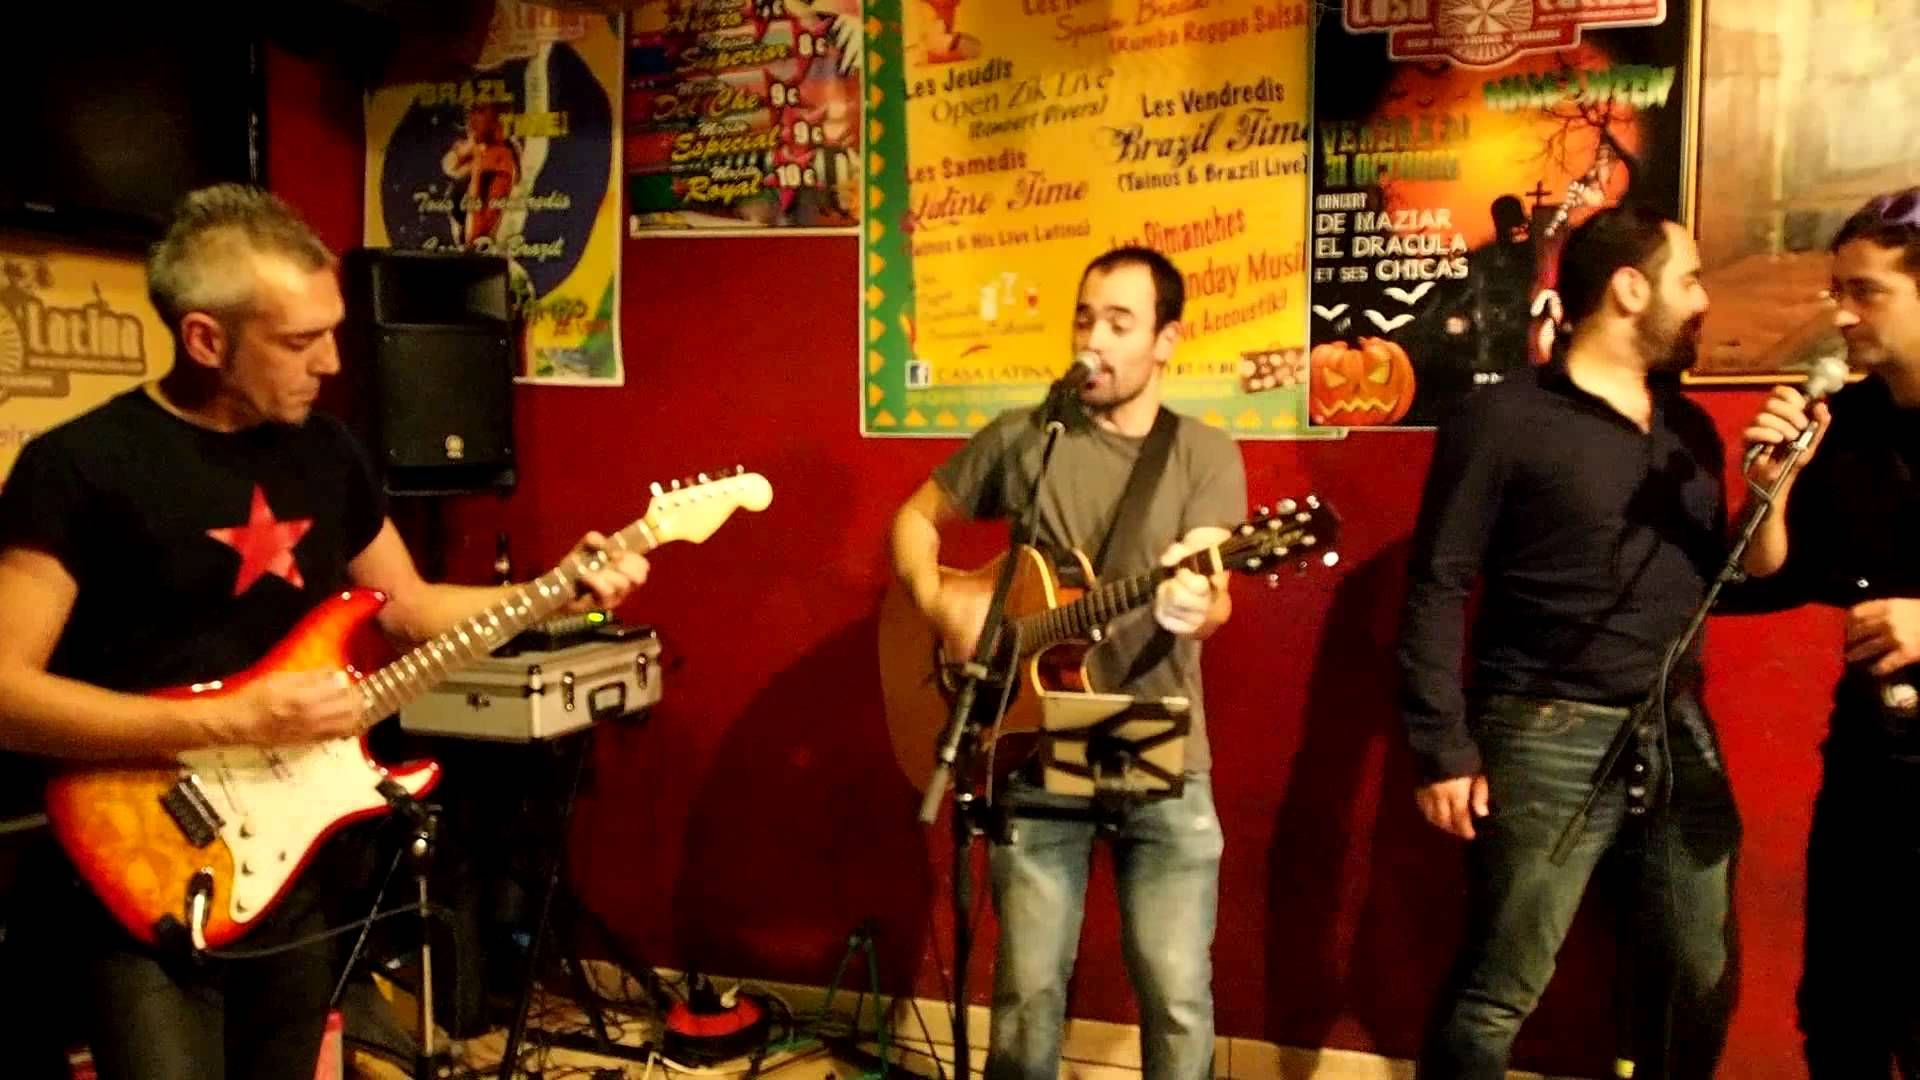 River Open Sunday Music Casa Latina le 16 novembre 2014